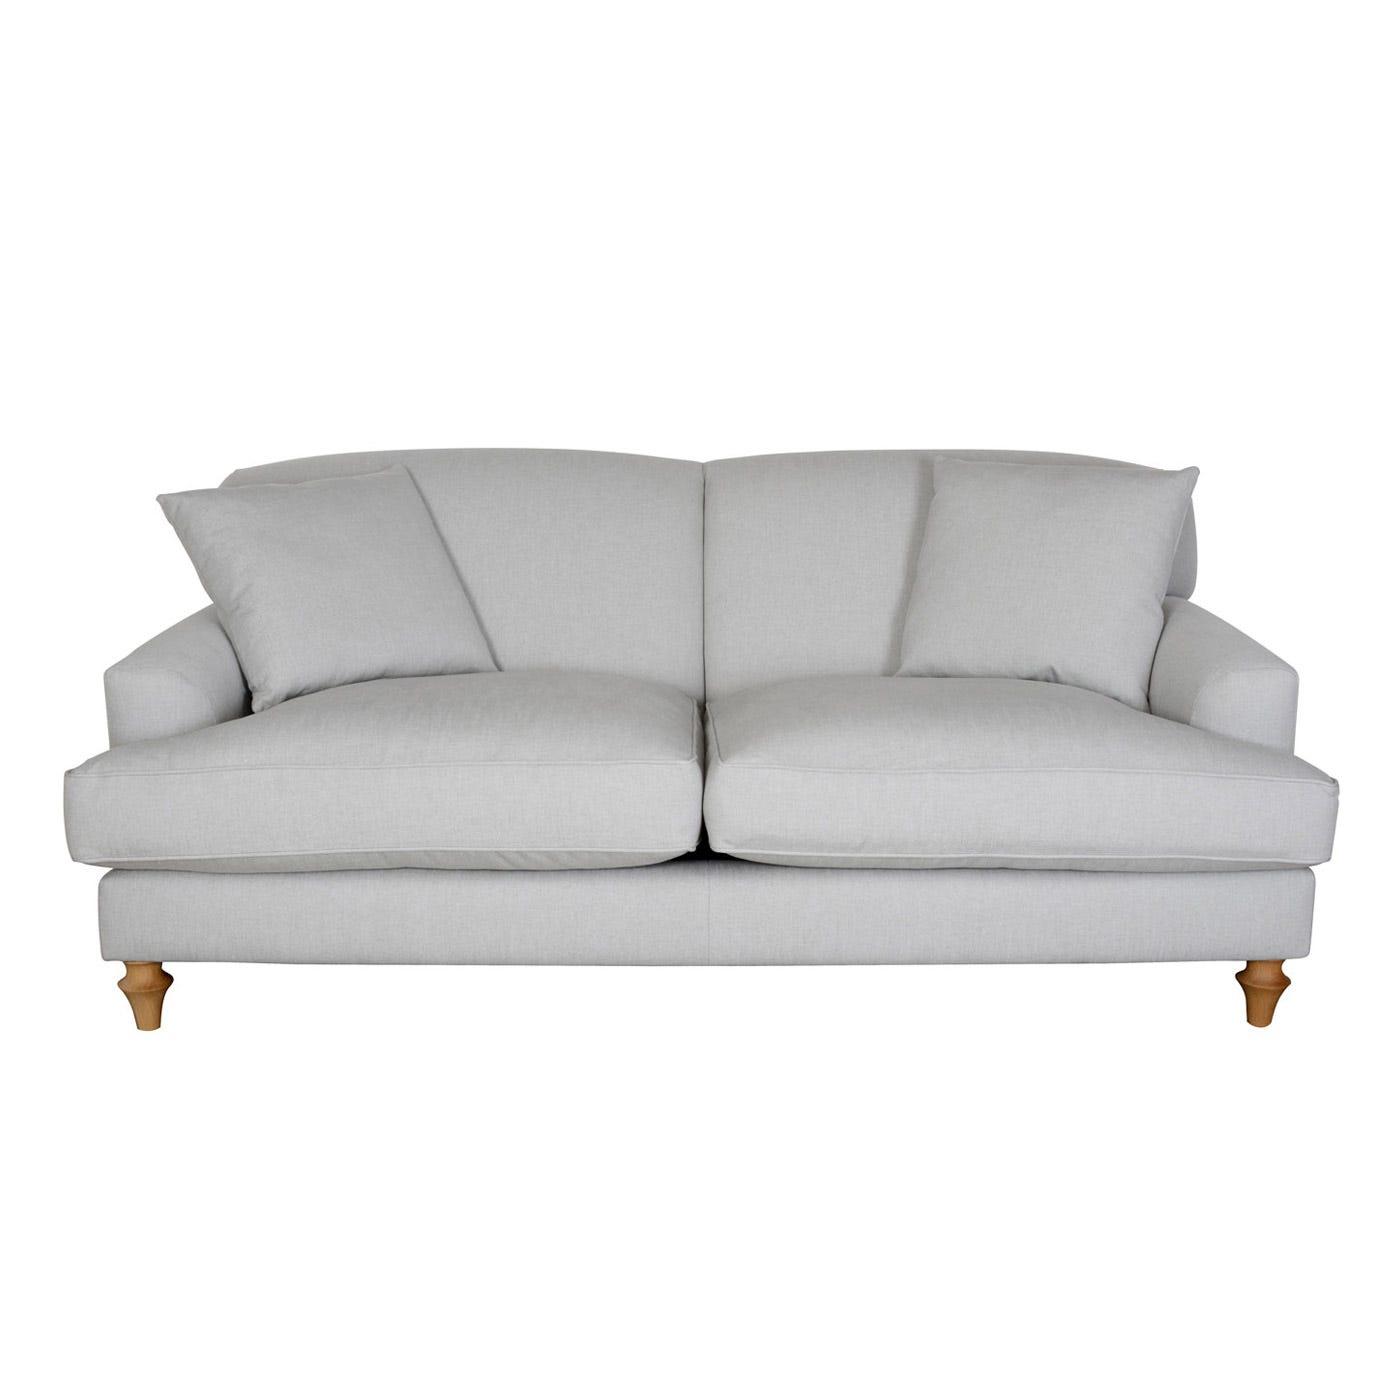 Banbury 4 Seater Sofa